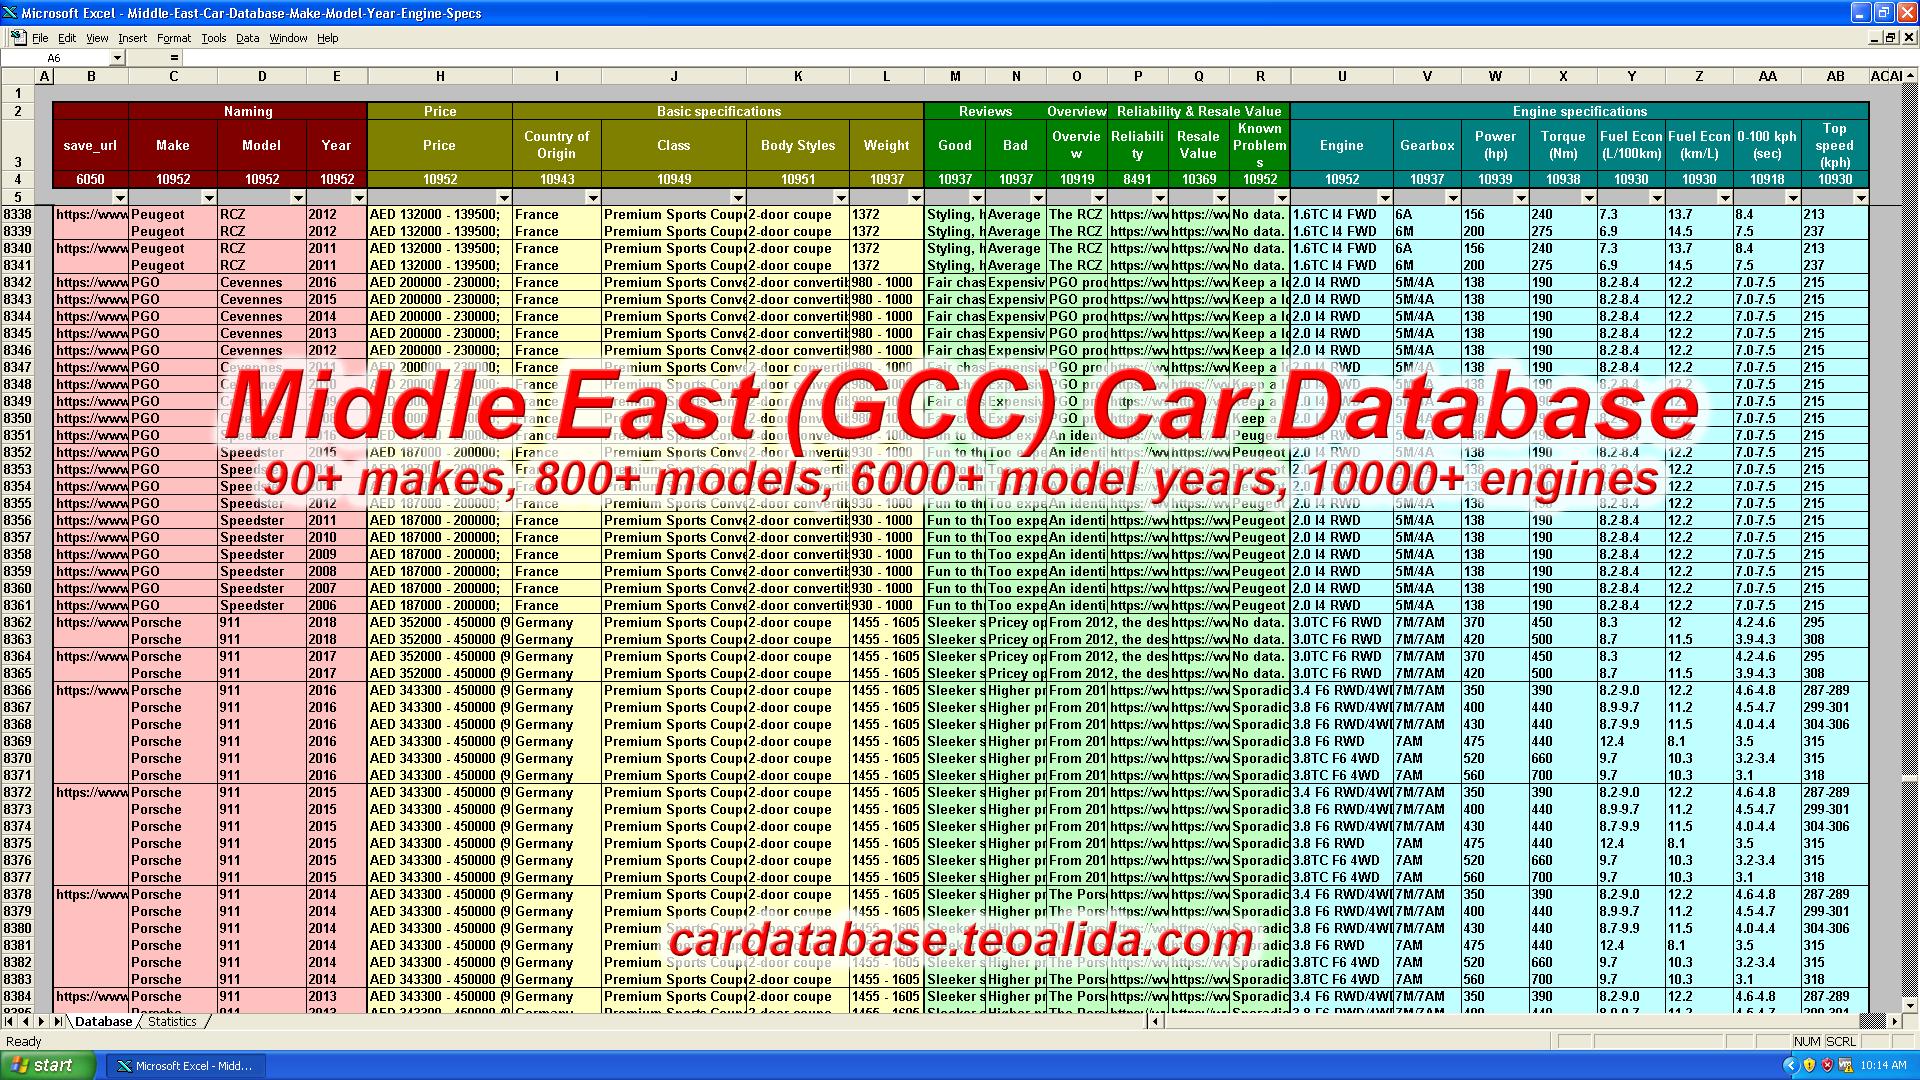 Middle East car database